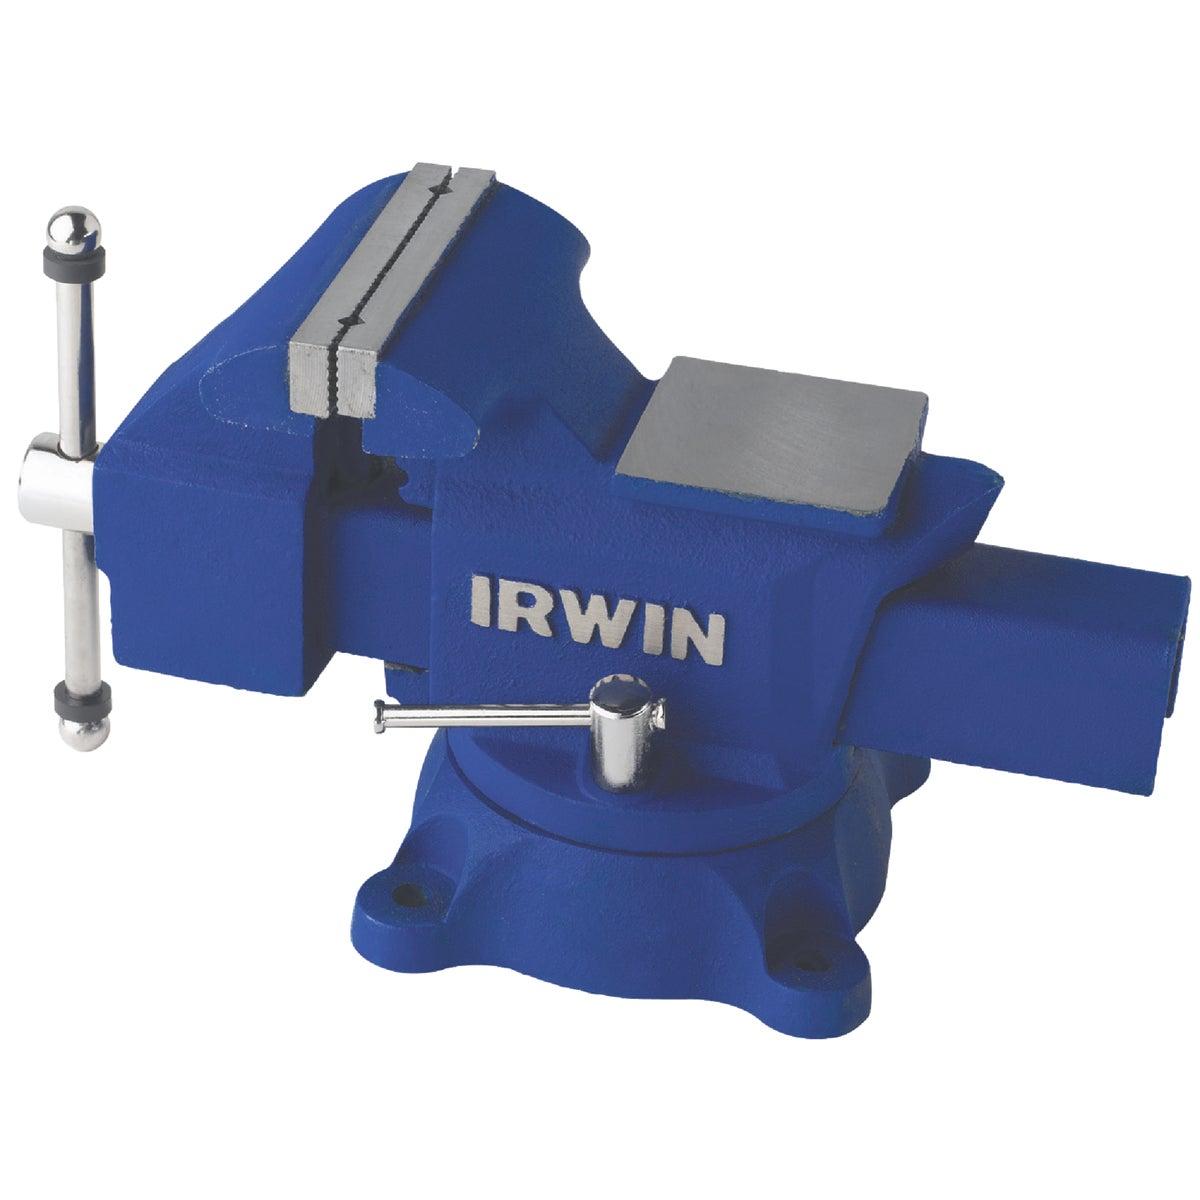 Irwin 4